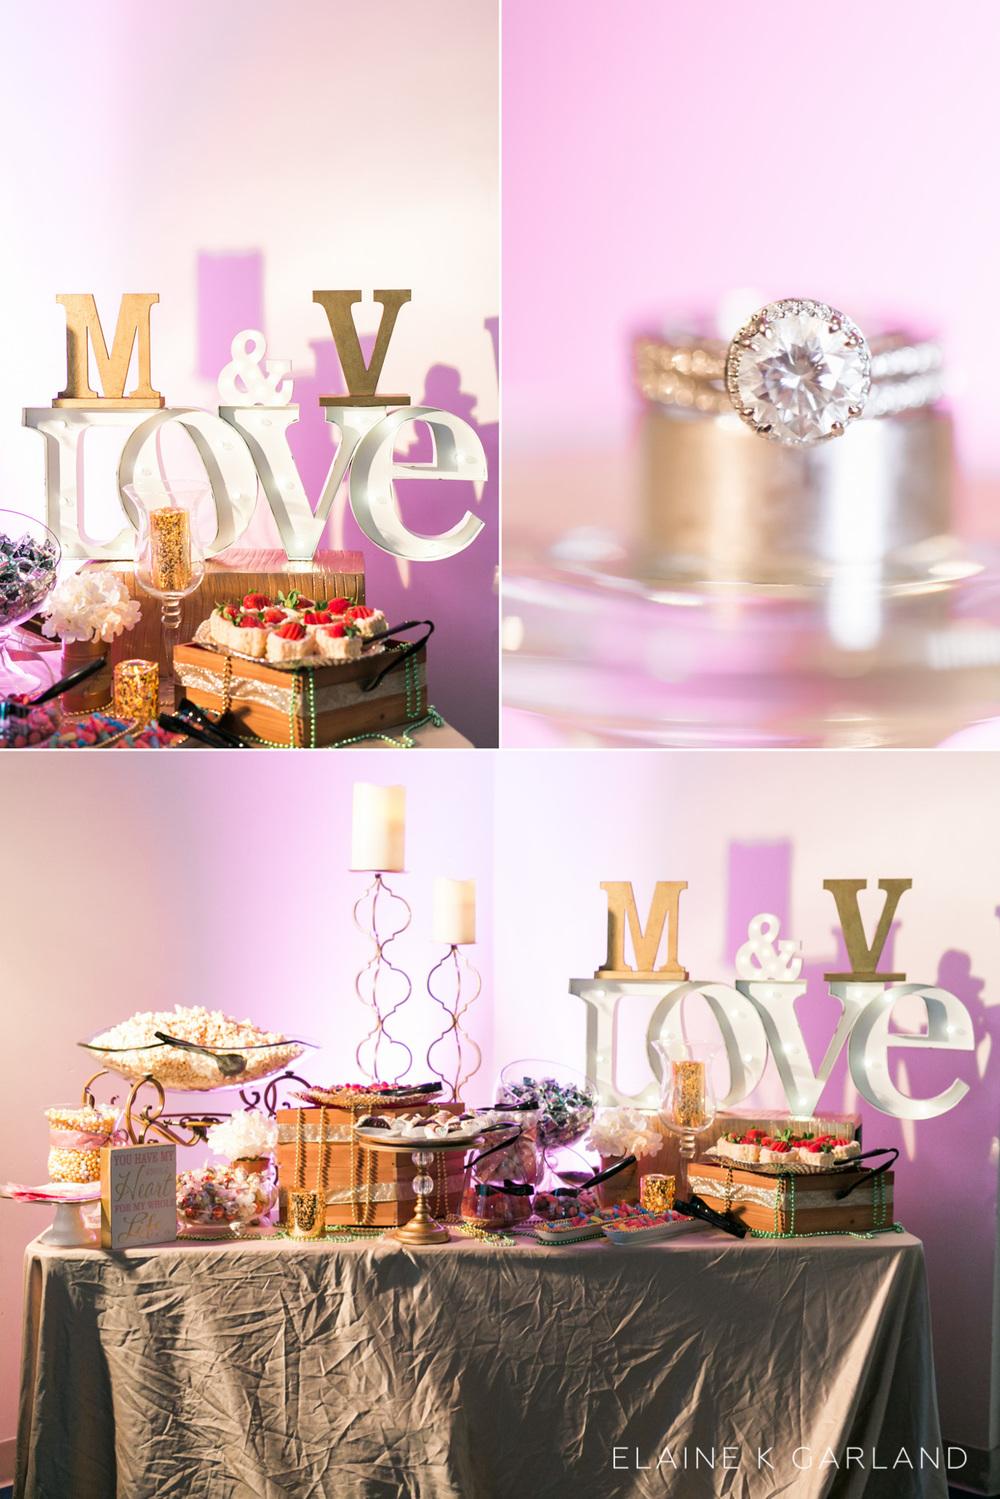 VU + MILLIE | TAMPA, FL WEDDING — Elaine K. Garland Photography